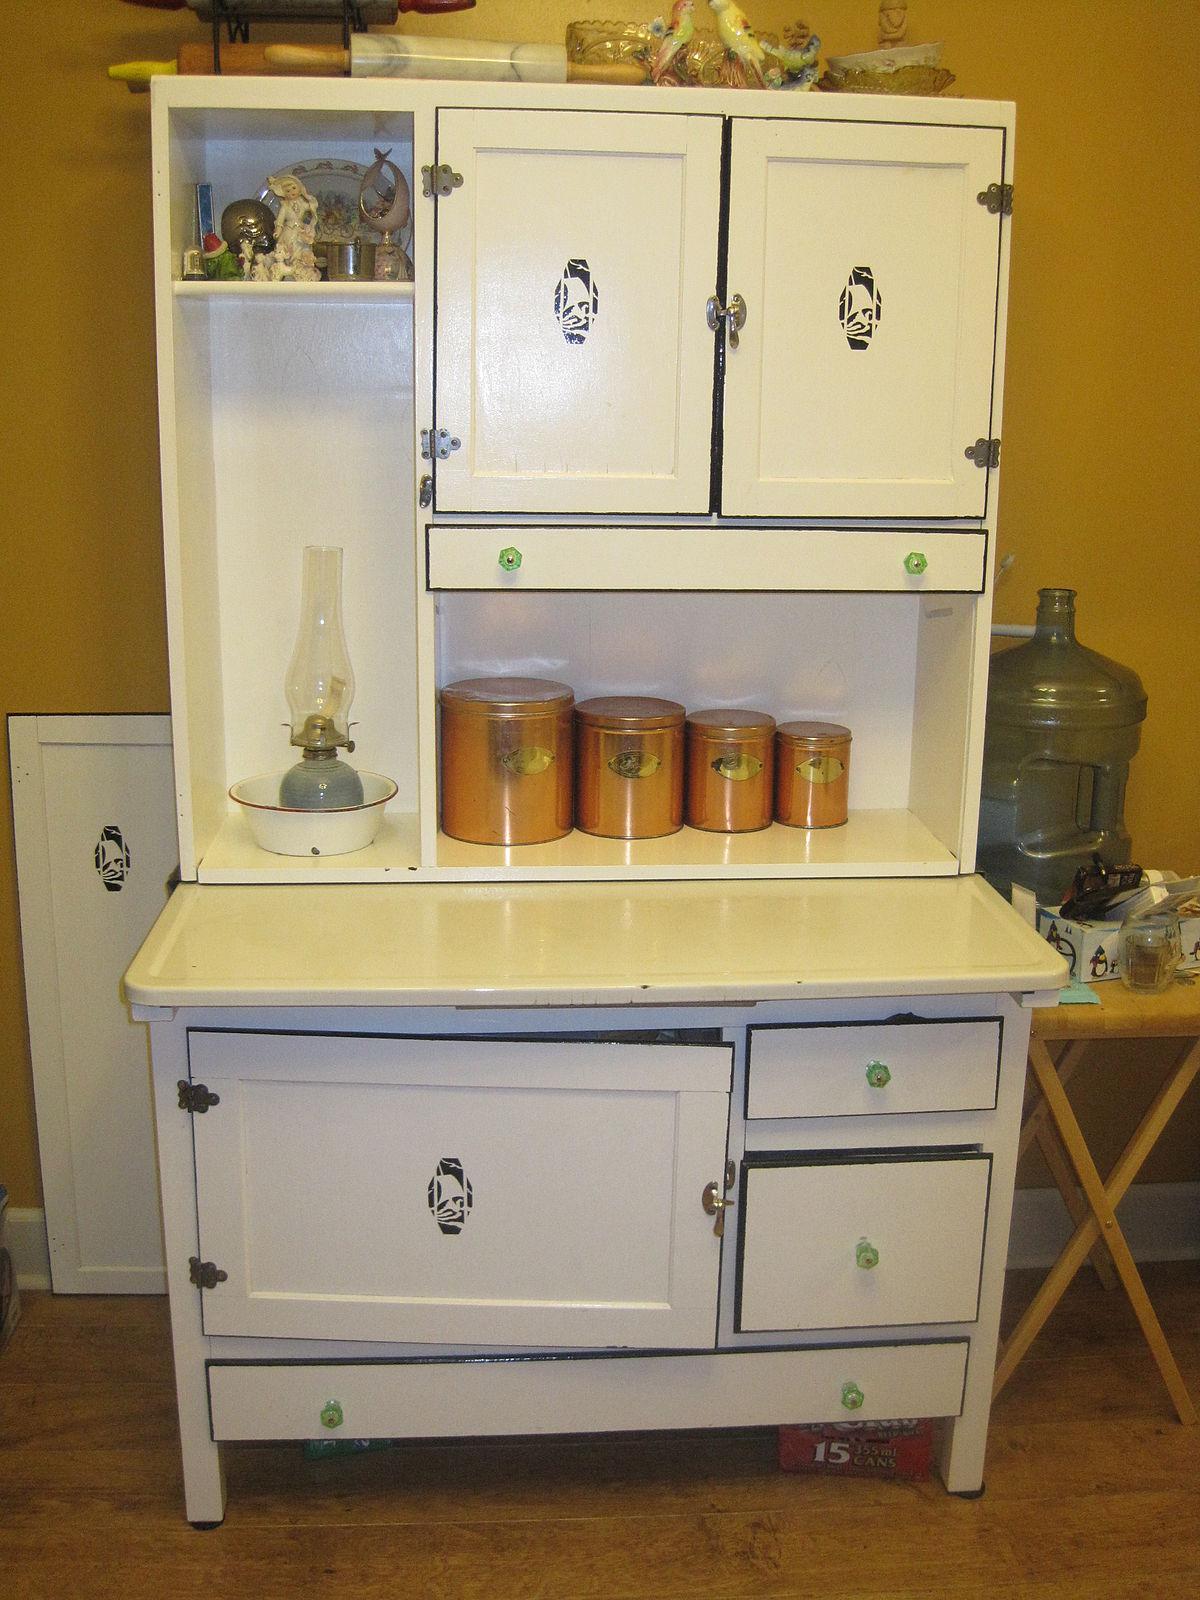 used kitchen cabinets indiana ninja mega complete system 1500 blender & food processor hoosier cabinet wikipedia